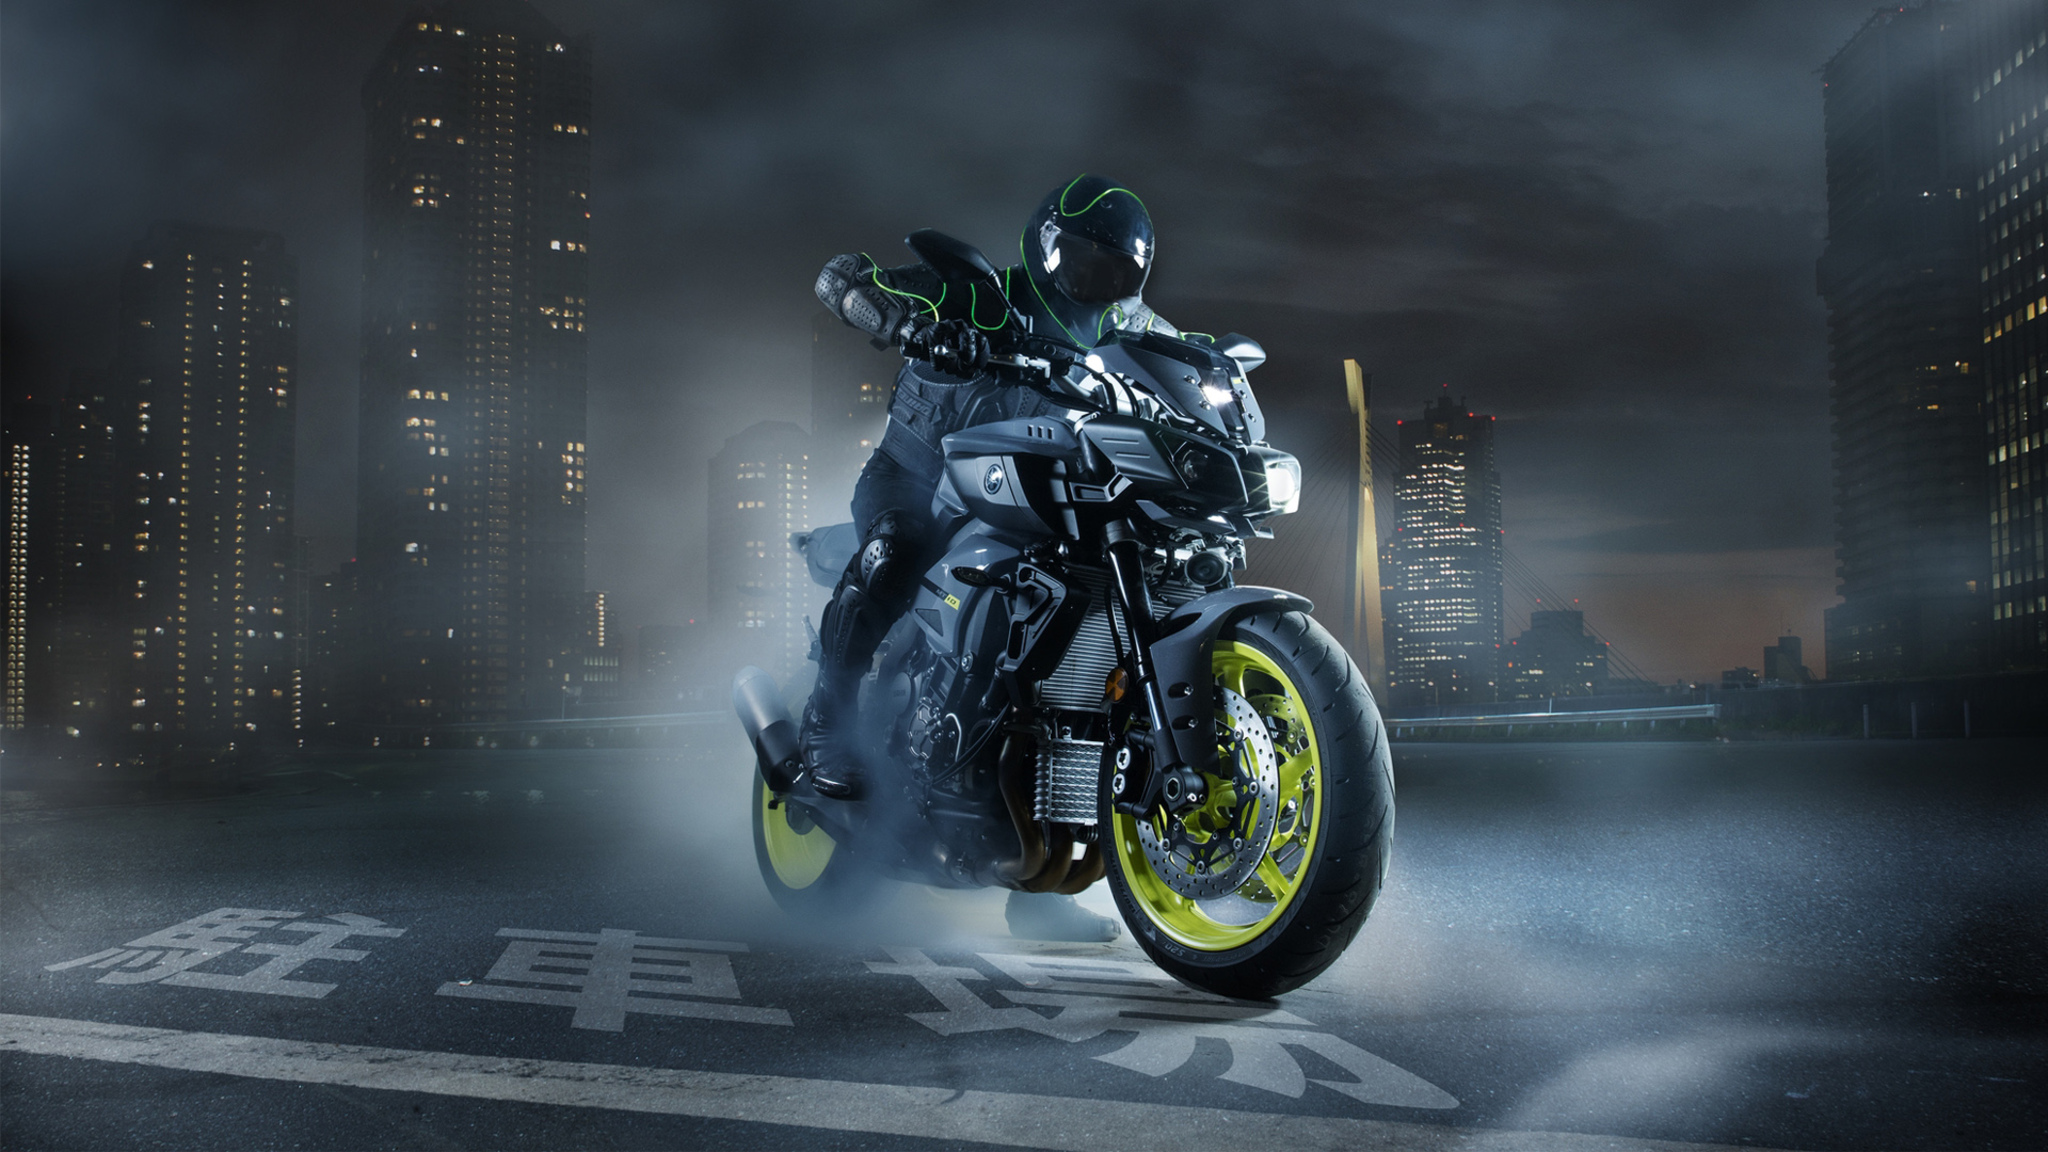 2048x1152 Yamaha Mt 10 2048x1152 Resolution HD 4k